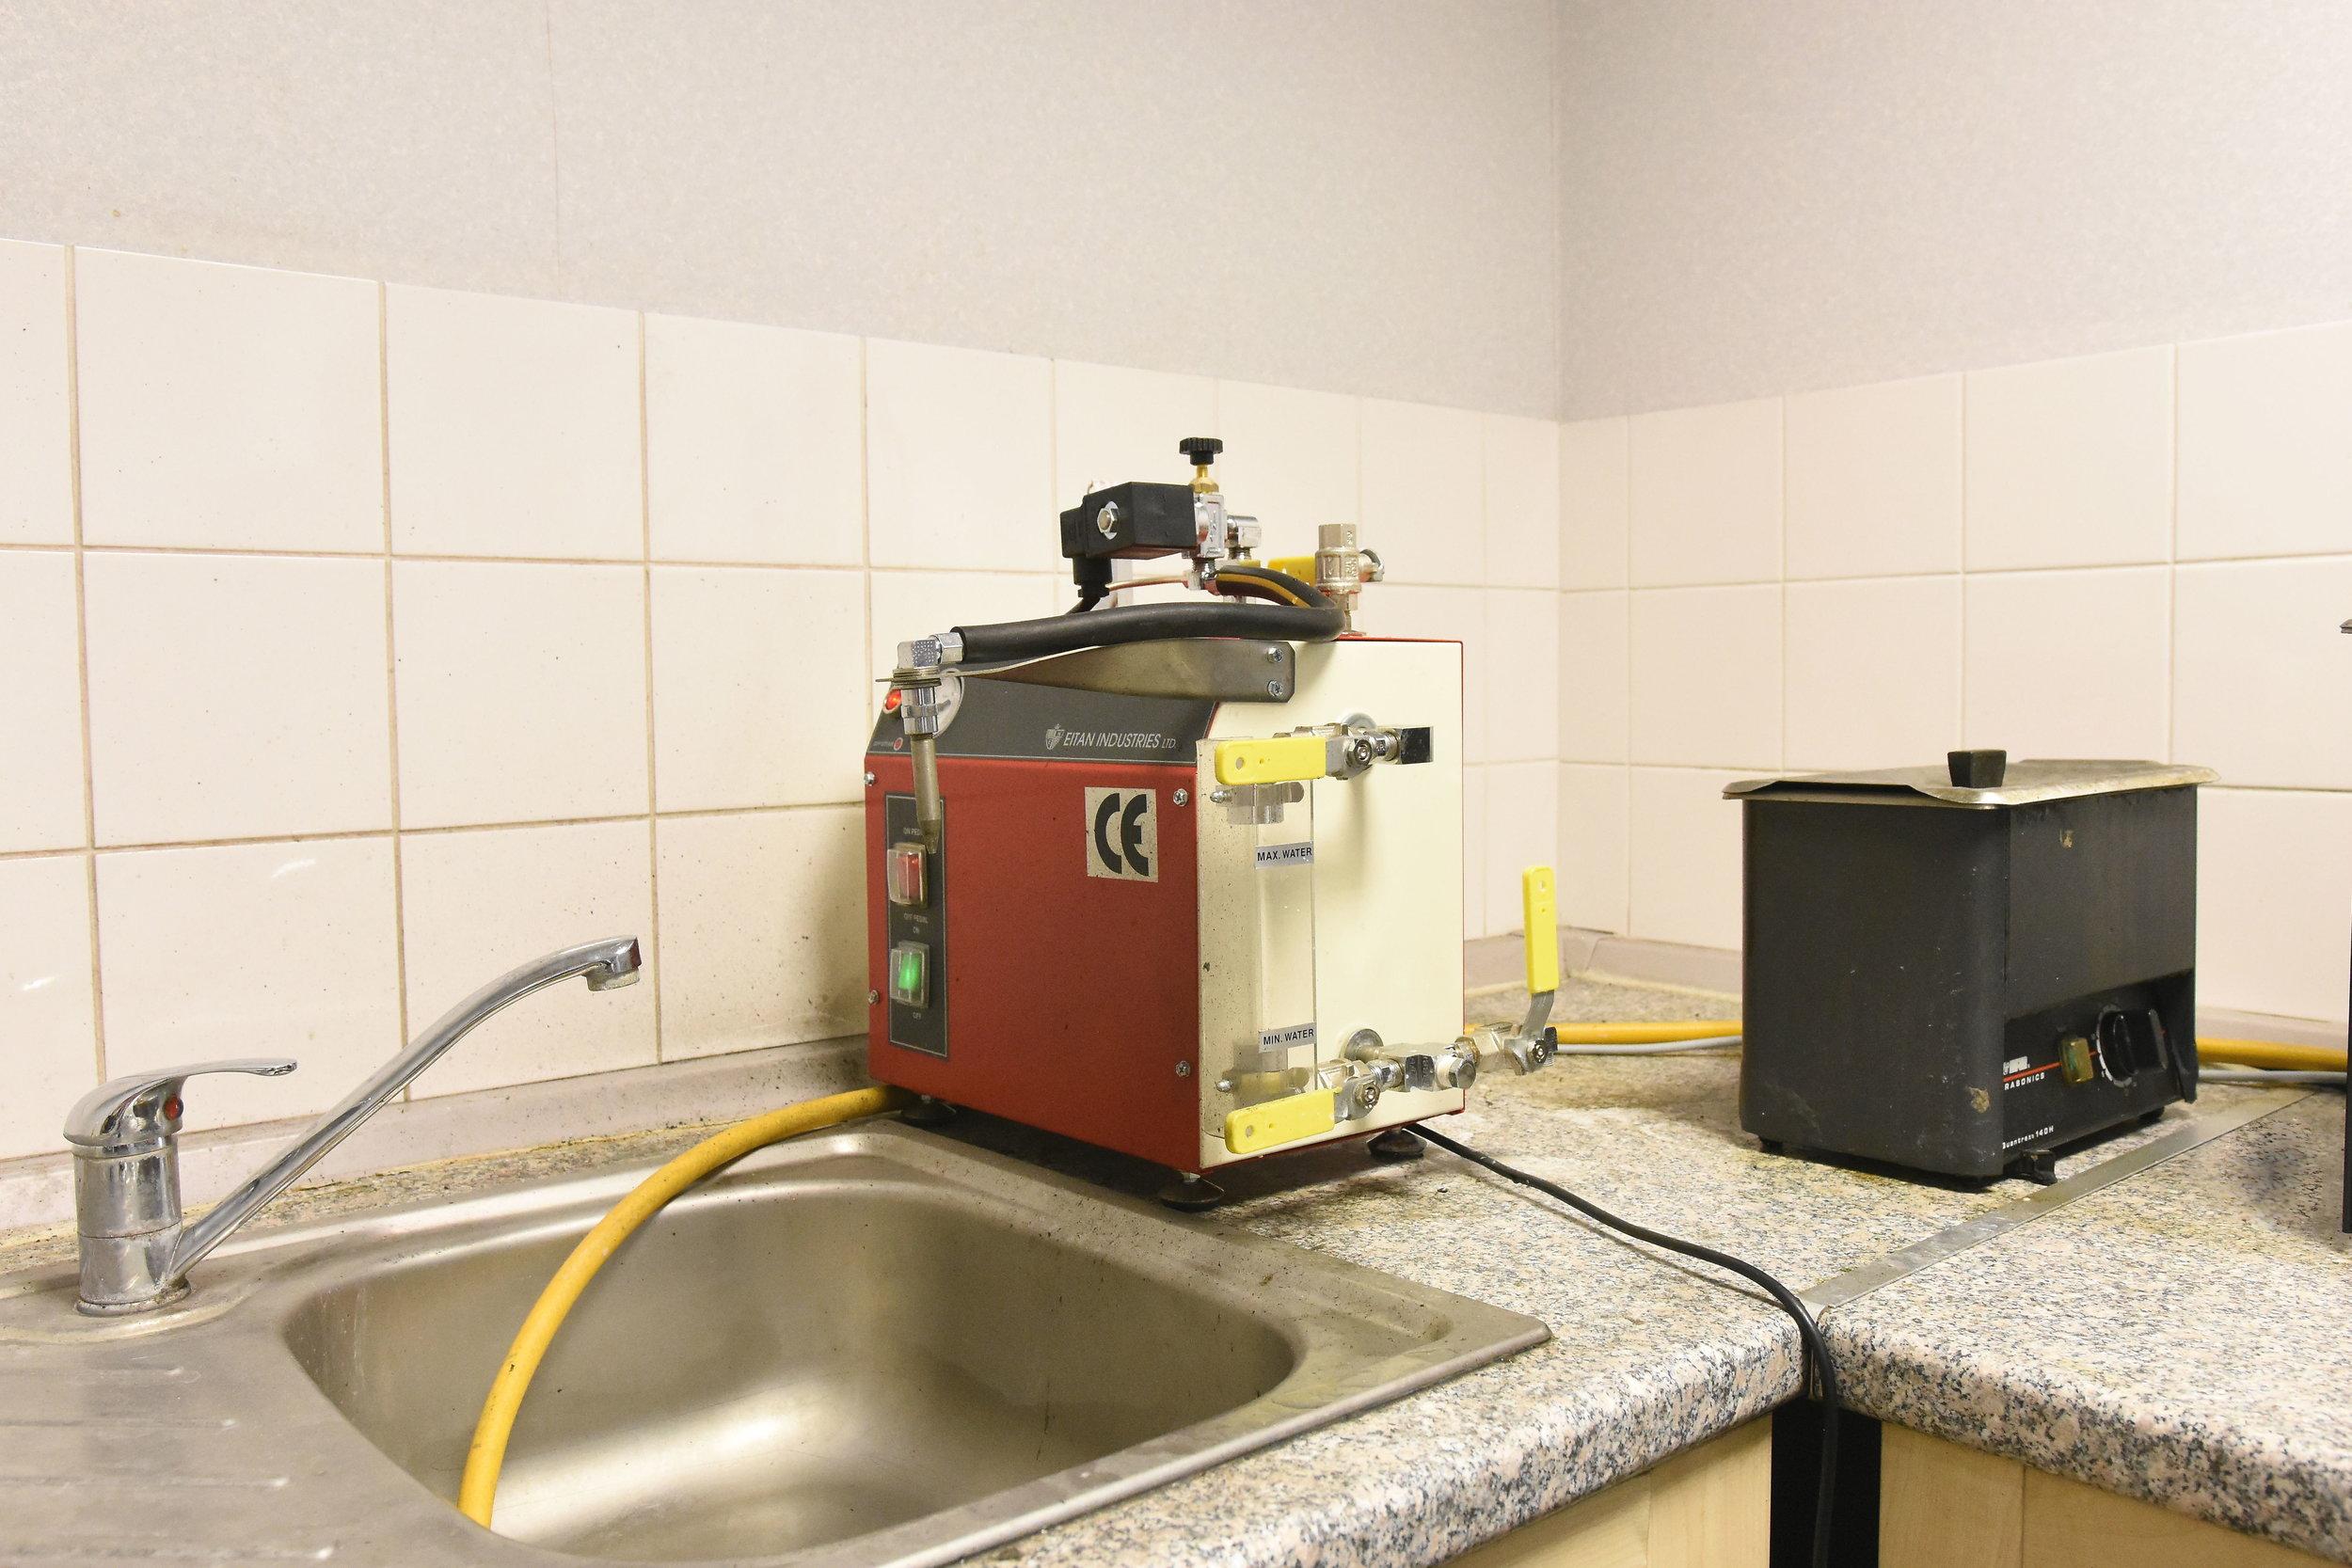 Eitan Steam Cleaner 12 bar Pressure